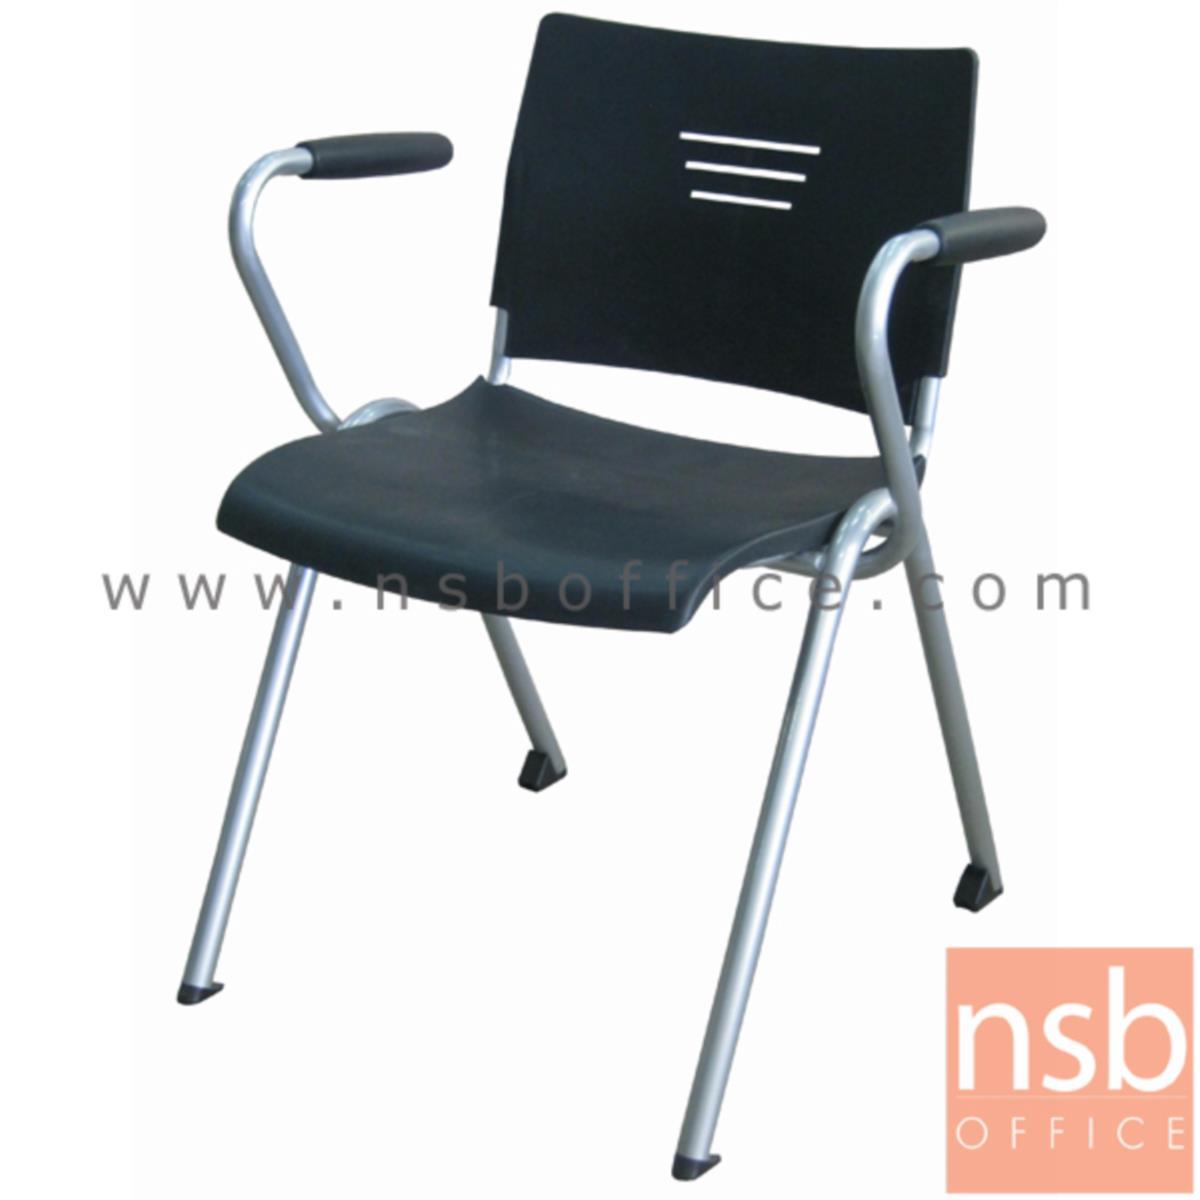 B05A131:เก้าอี้อเนกประสงค์เฟรมโพลี่ รุ่น Merlock (เมอร์ล็อก)  ขาเหล็กพ่นสี epoxy